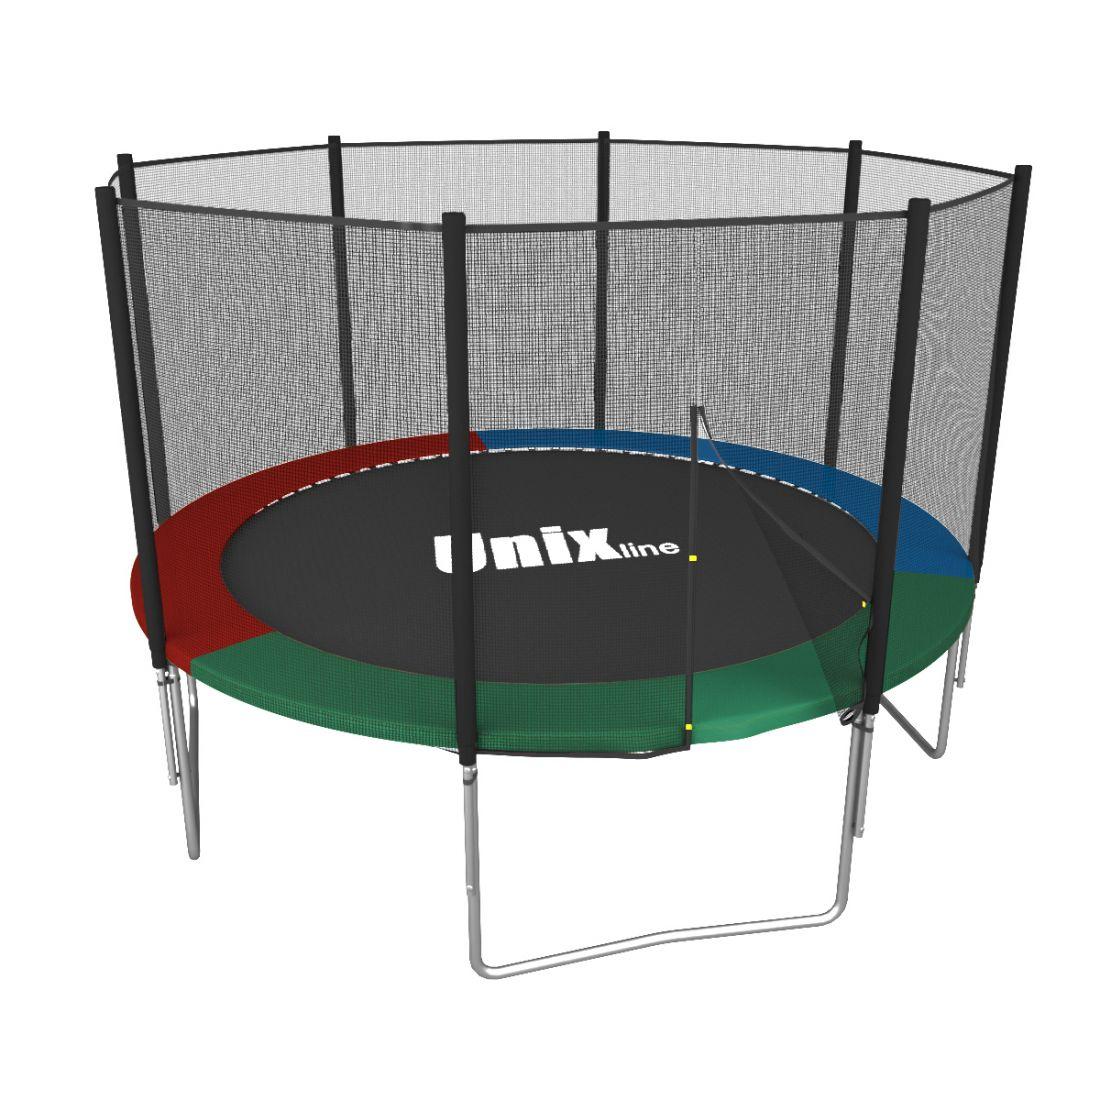 Батут Unix line Simple 8 ft Color/Green (outside)